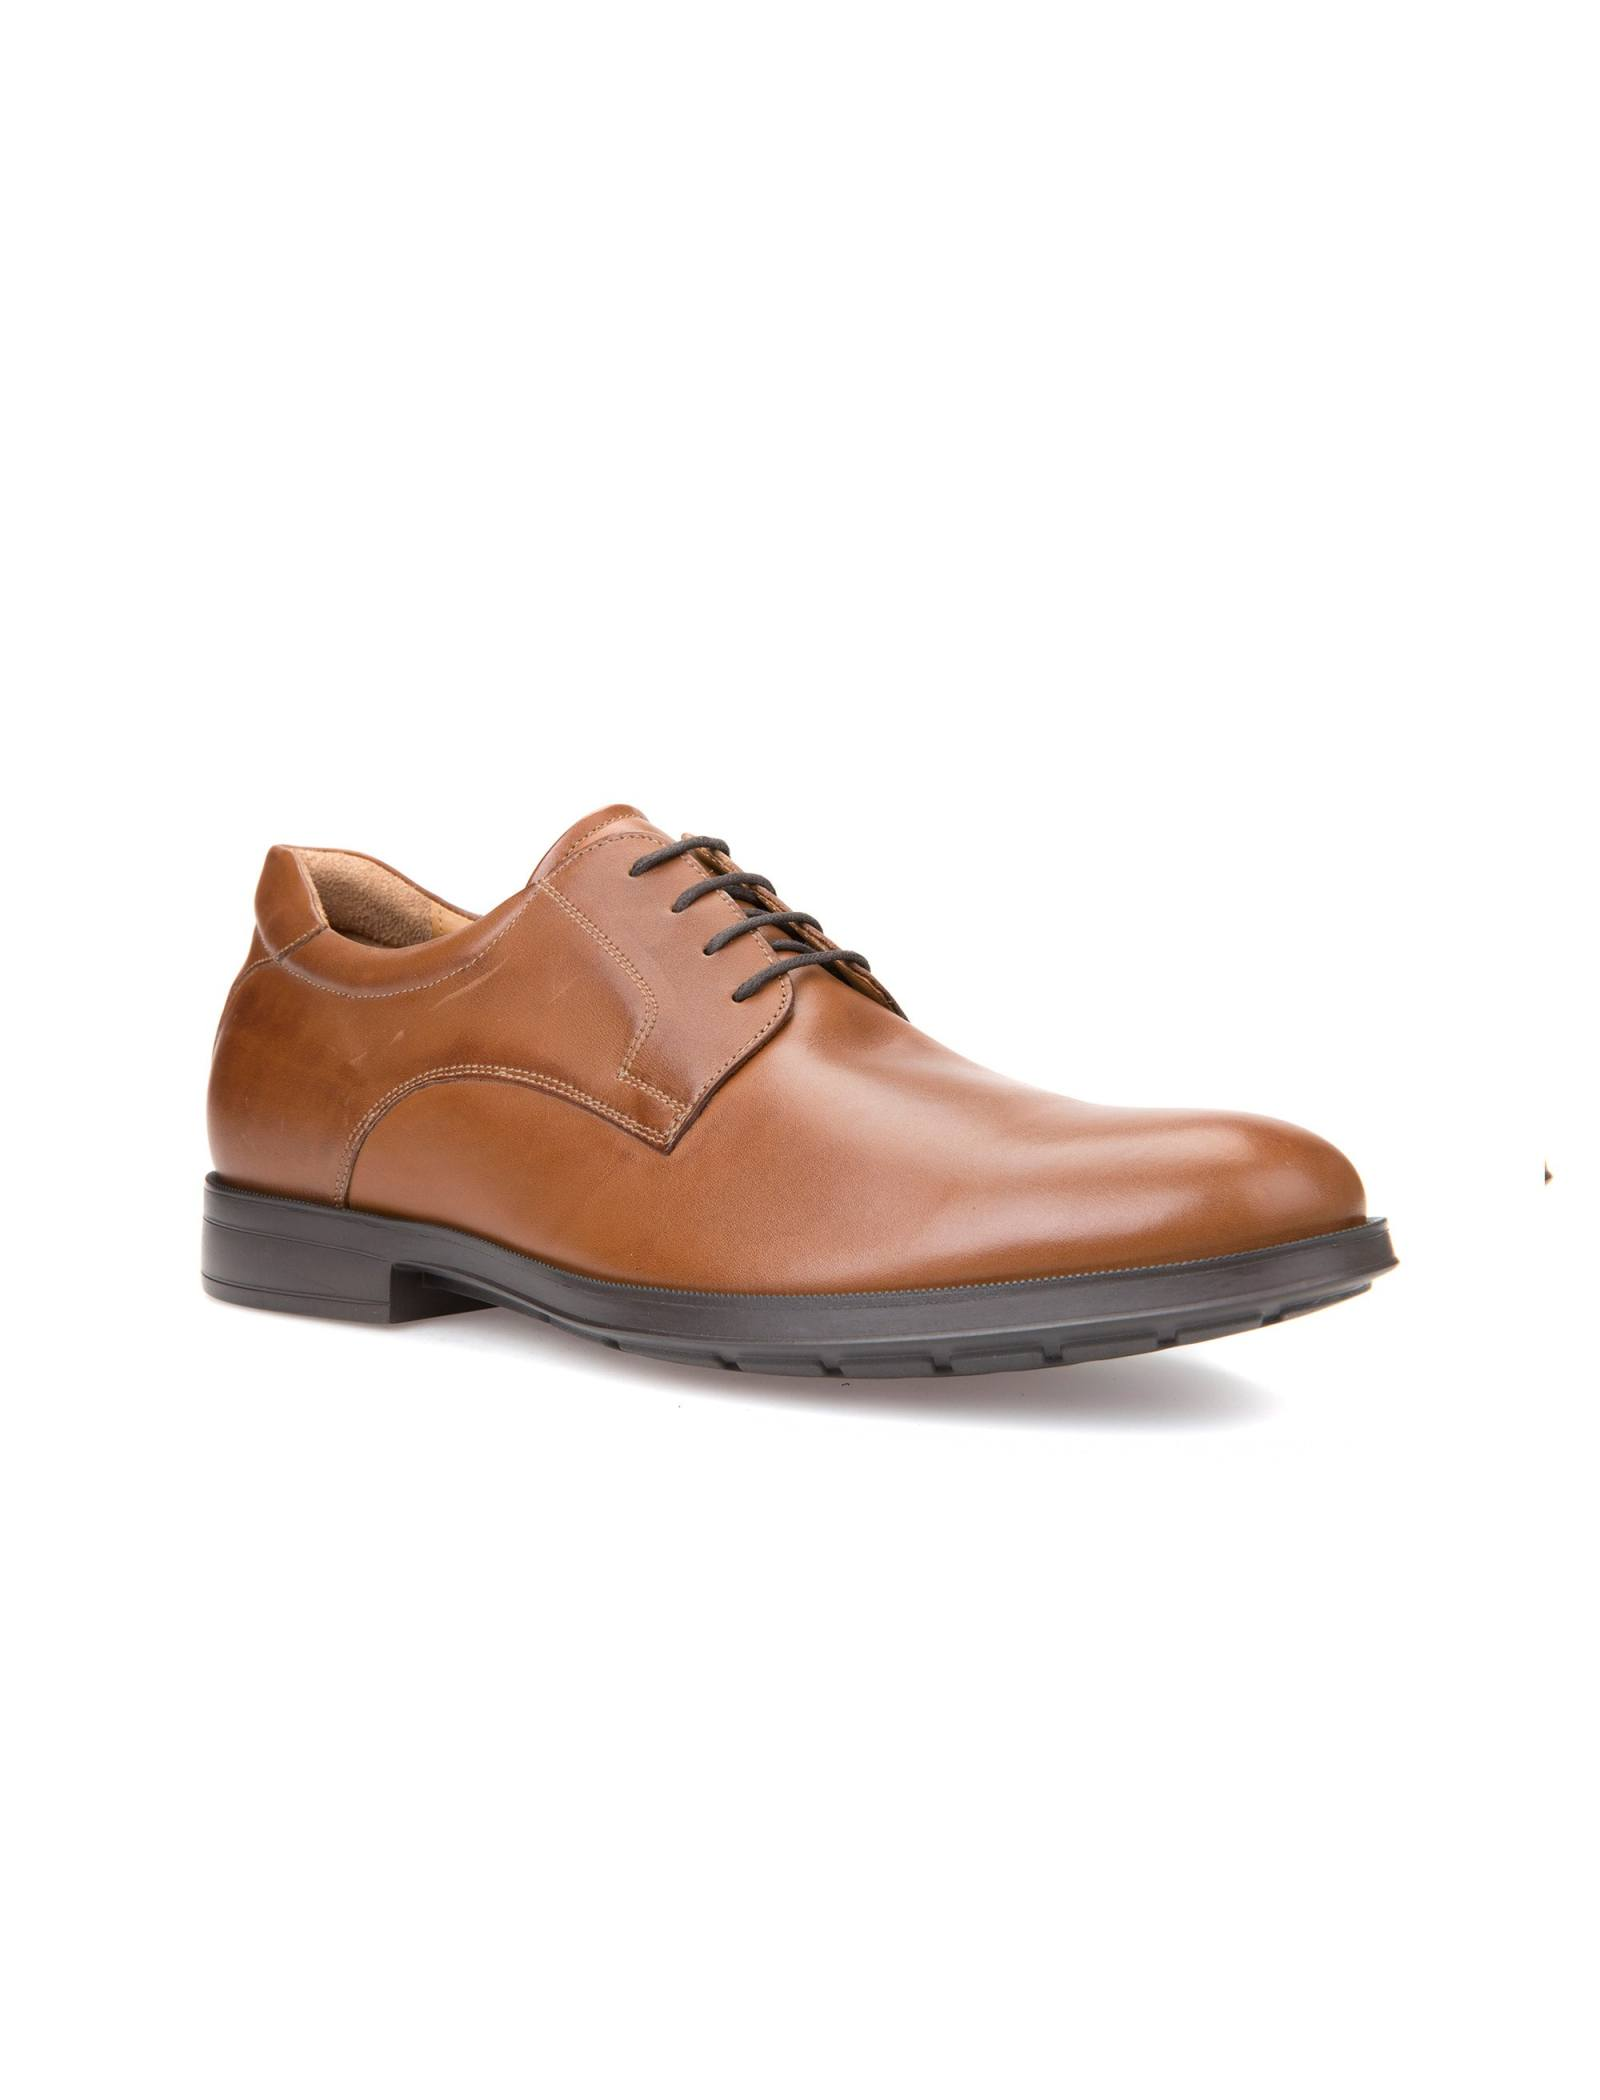 کفش اداری چرم مردانه Hilstone - جی اوکس - قهوه اي  - 6